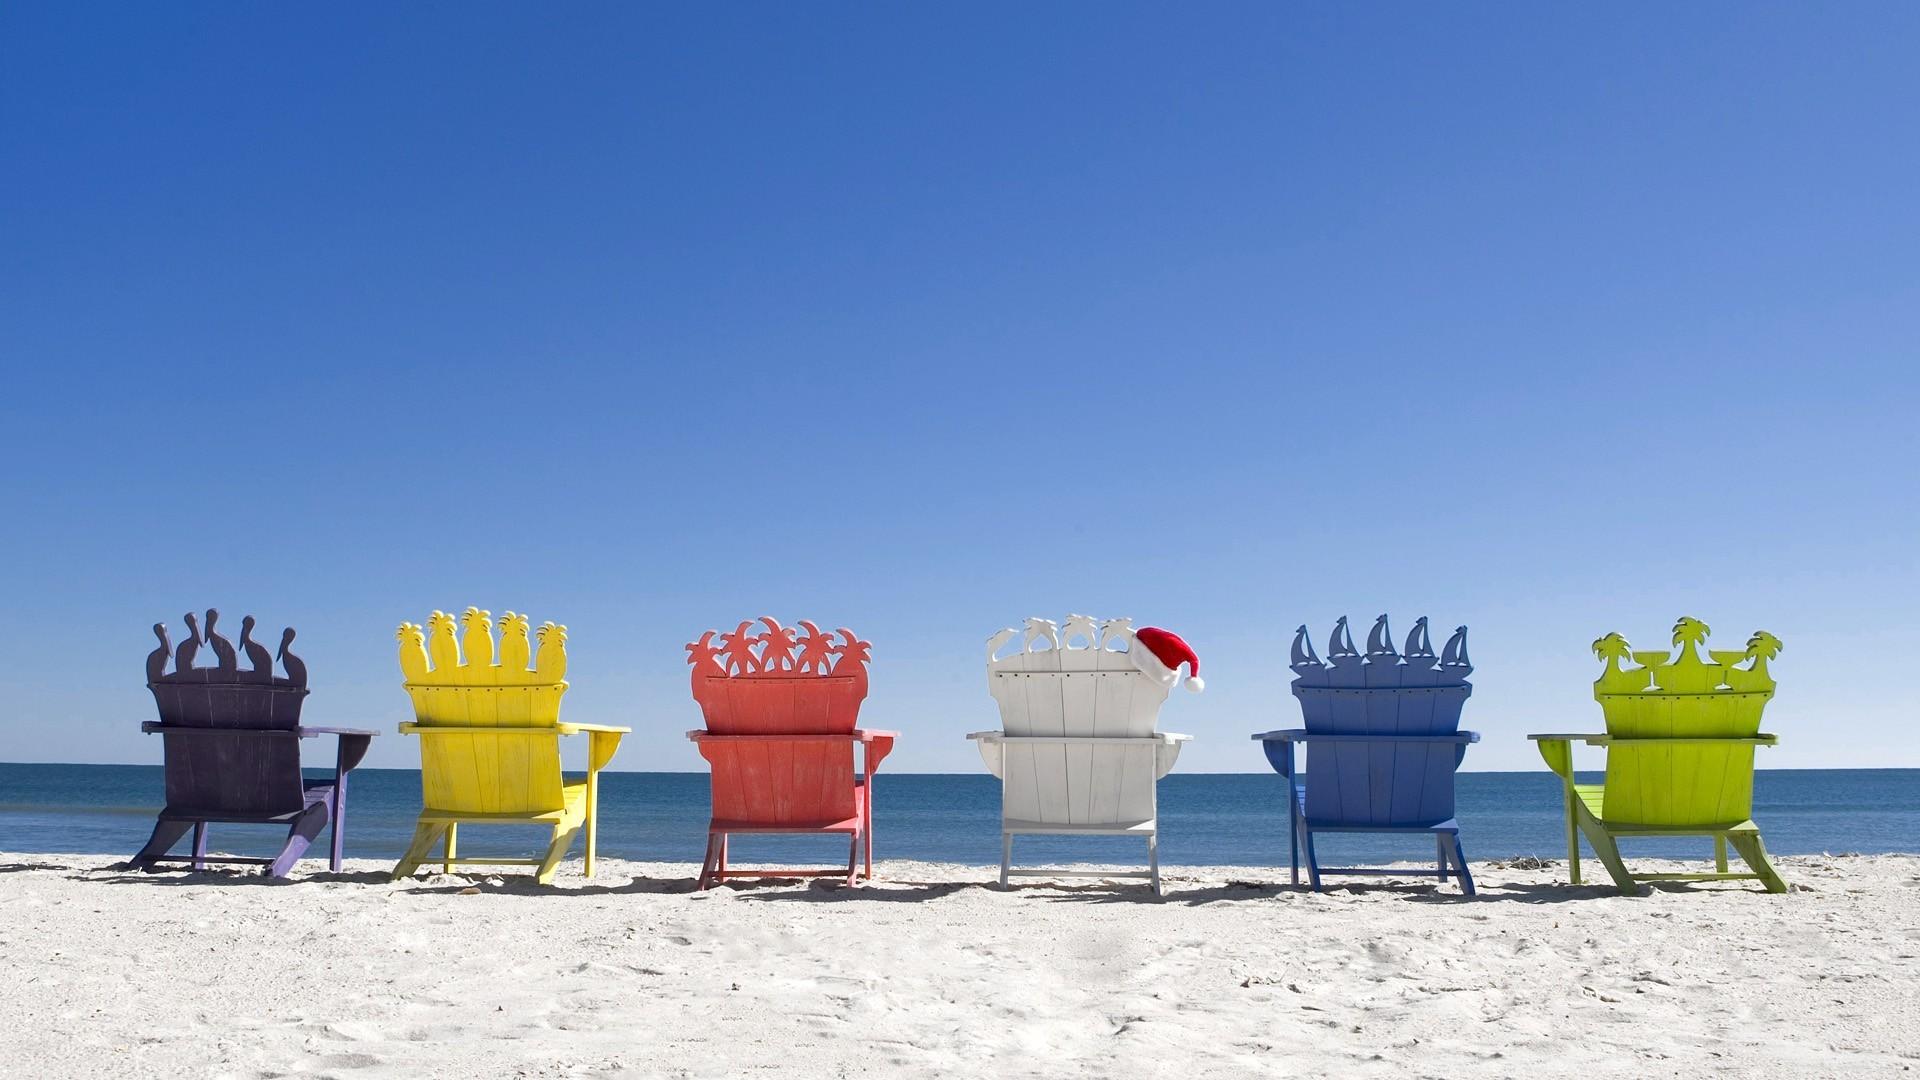 Myrtle Beach Wallpapers   Download Free Desktop Wallpaper Images .